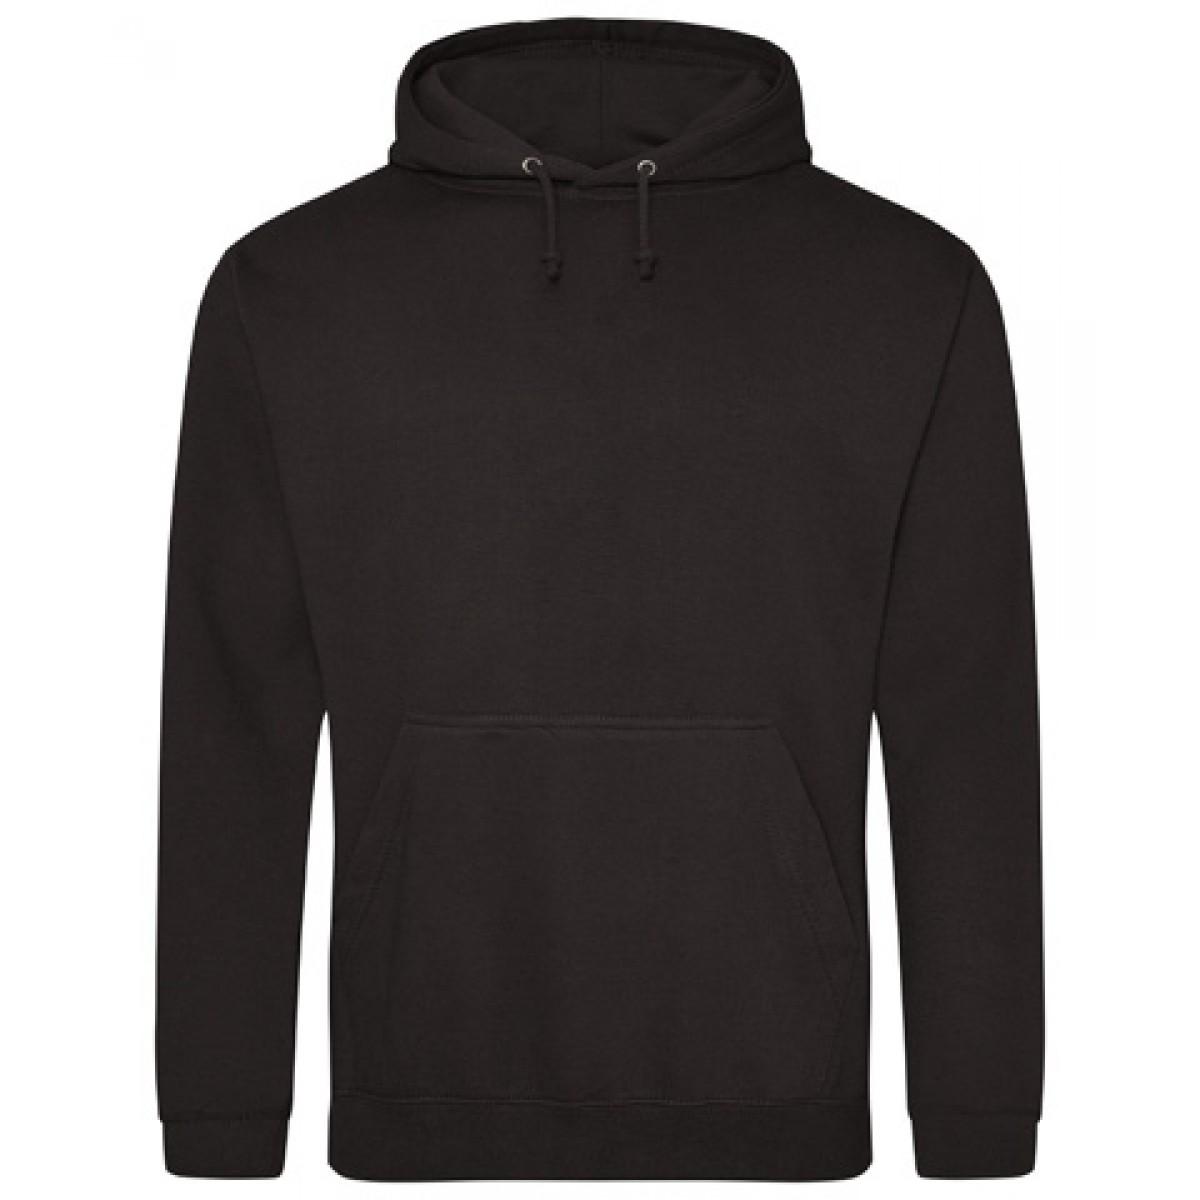 Hooded Sweatshirt 50/50 Heavy Blend-Black-XL